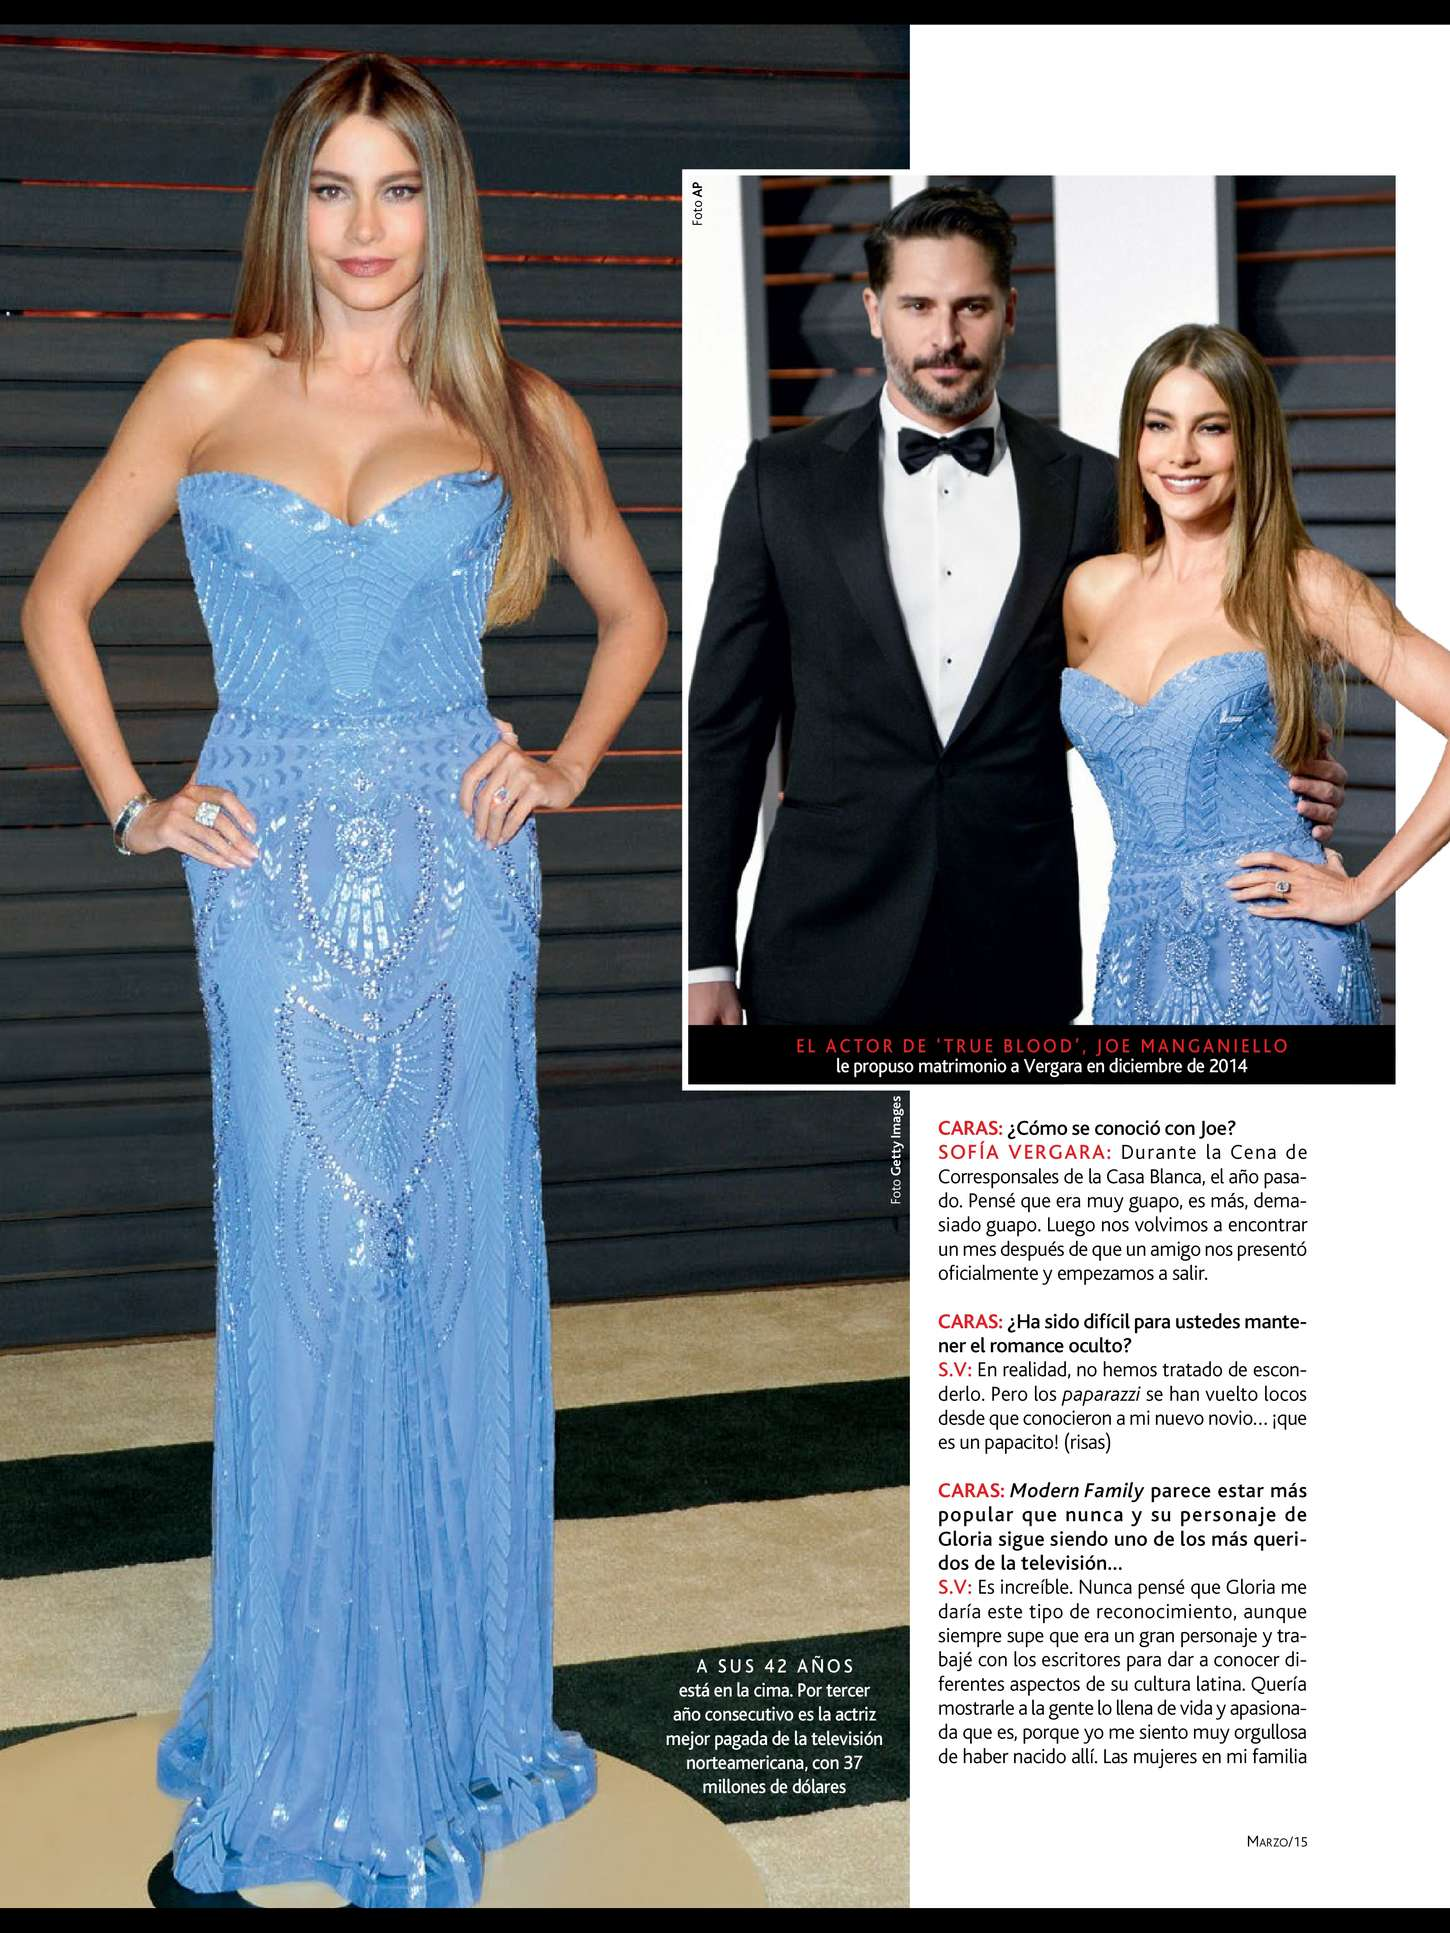 Uncategorized 2015 : Sofía Vergara: Caras Magazine 2015 -06